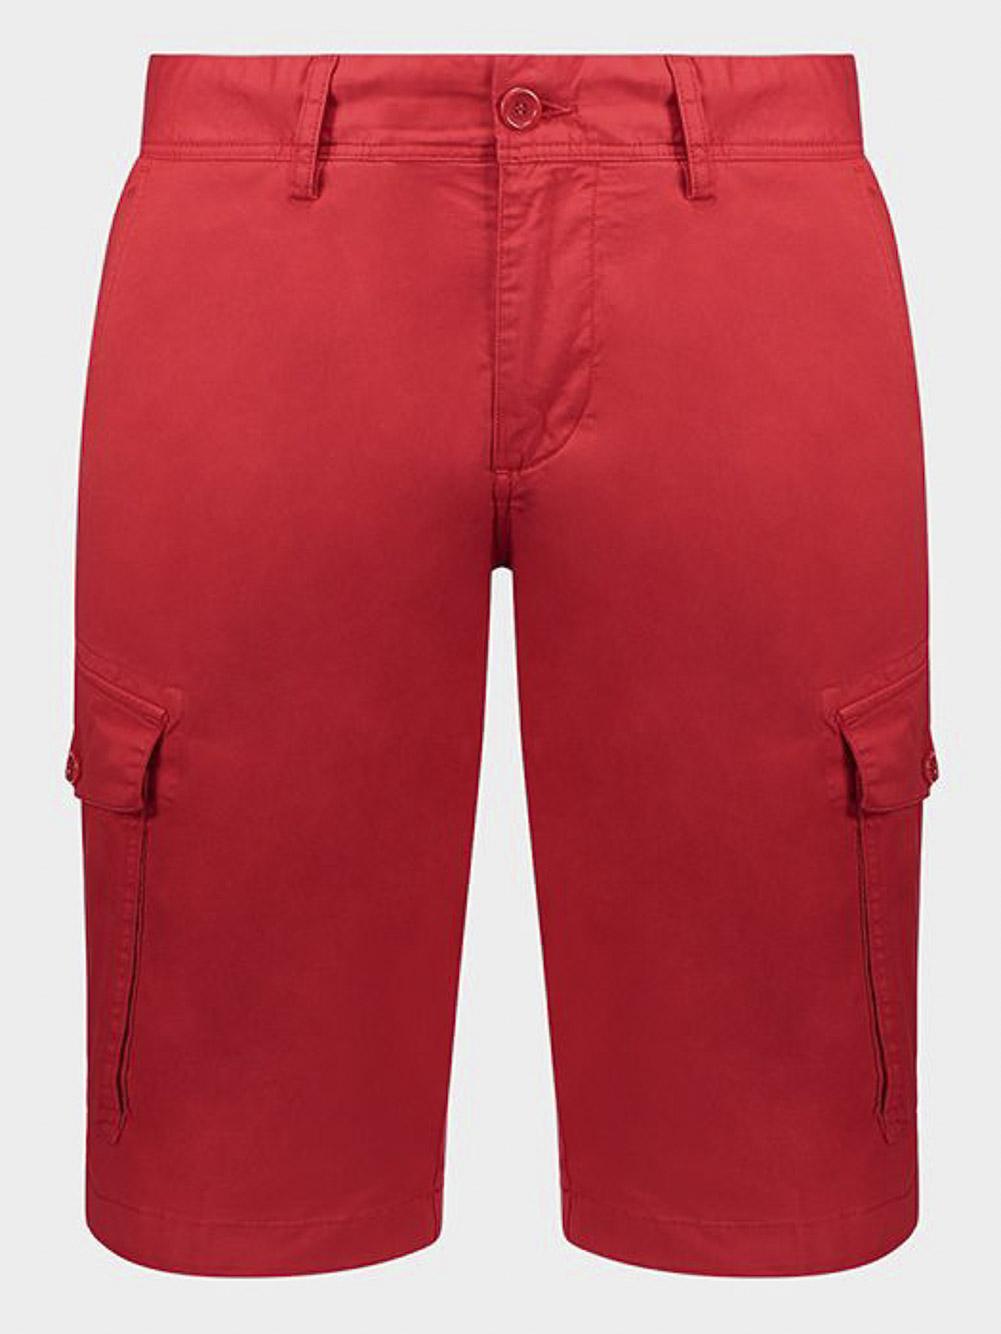 PAUL & SHARK Βερμούδα με πλαινές τσέπες E20P4003-577 ΚΟΚΚΙΝΟ